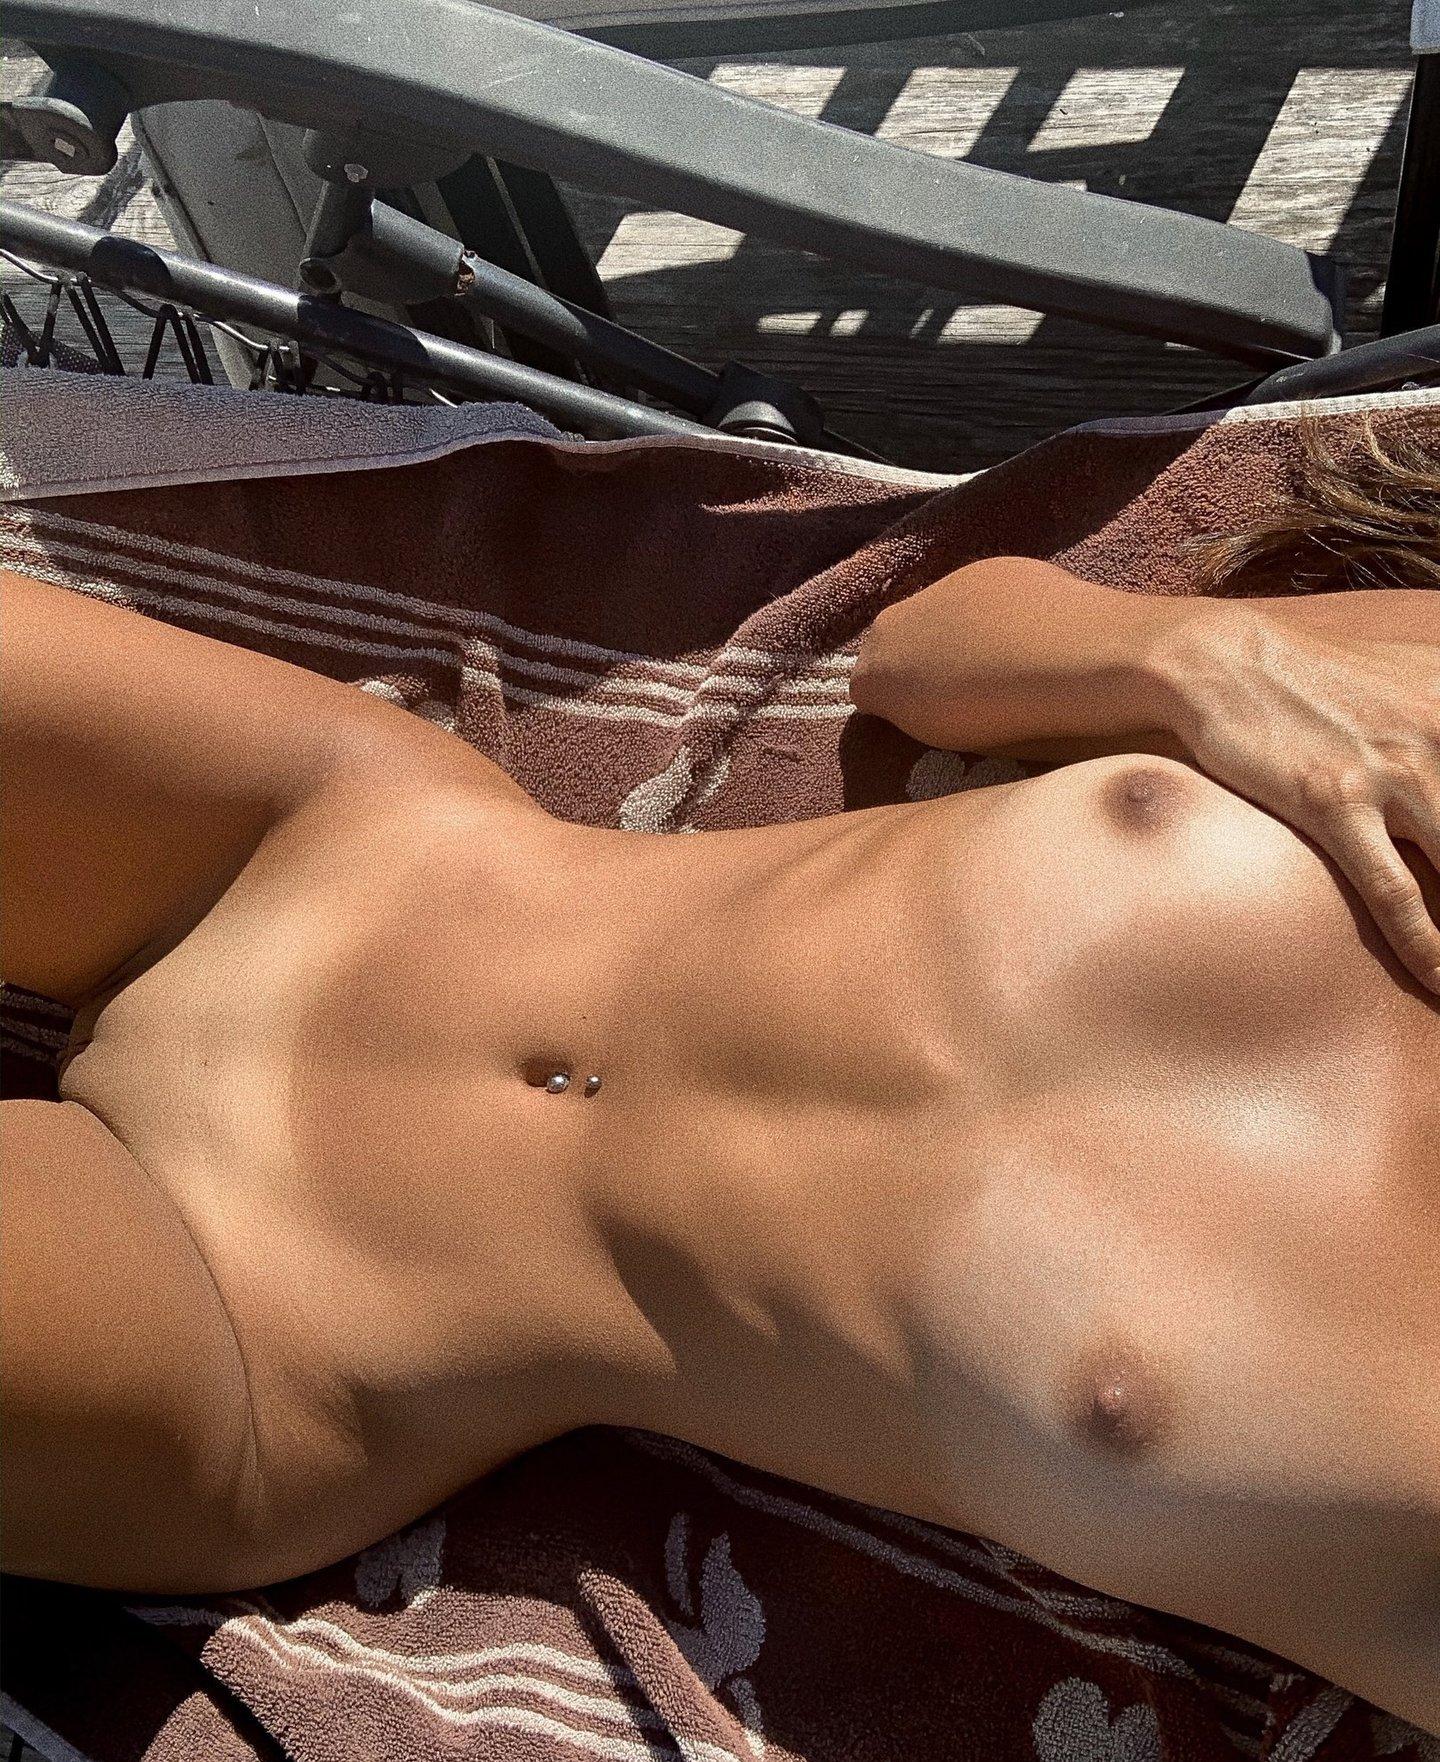 Goddess Angelina Angelina Onlyfans Nude Leaks 0024